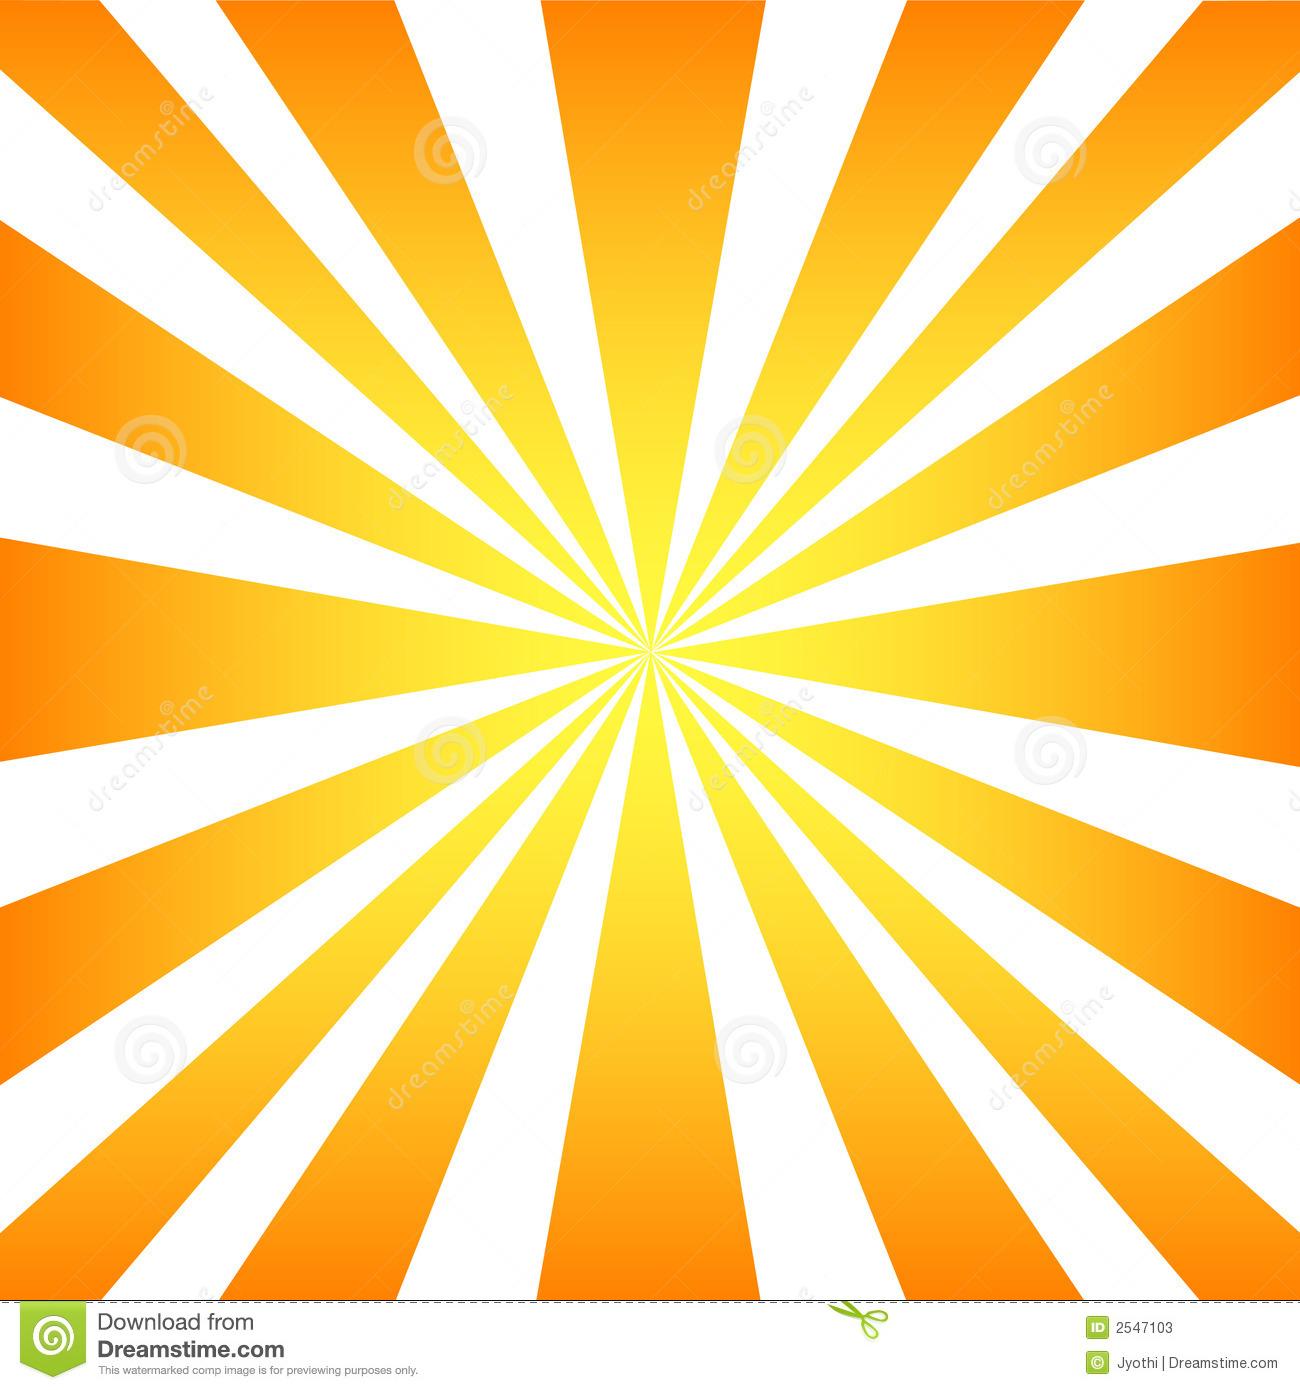 hight resolution of sun rays stock photos image 2547103